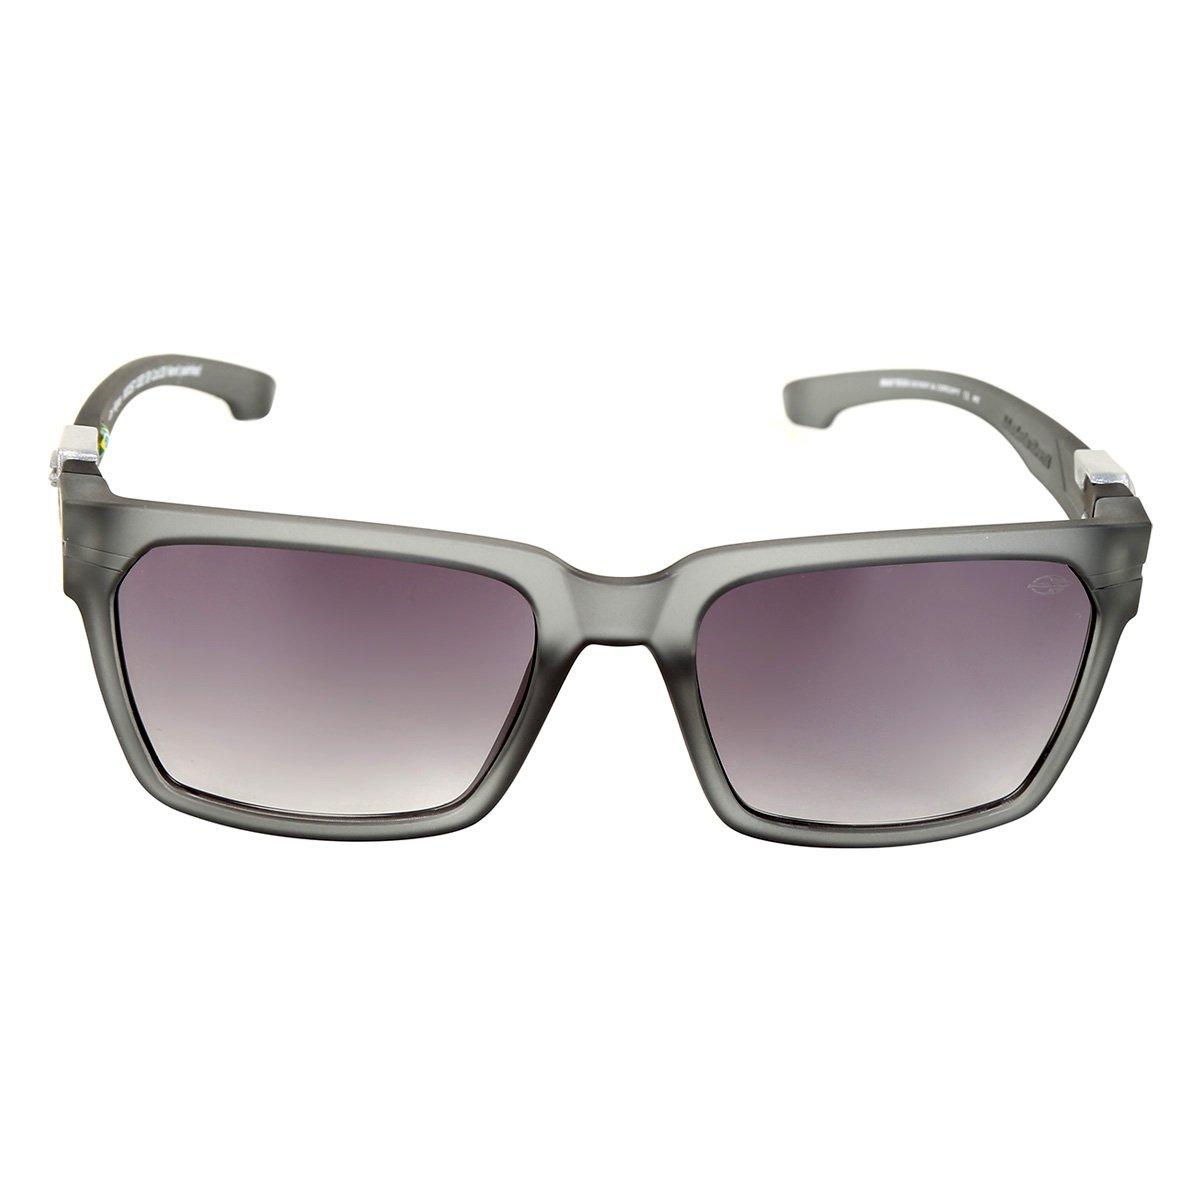 68bb19d1379bf Óculos De Sol Mormaii Las Vegas Fumê Fosco Masculino - Preto ...